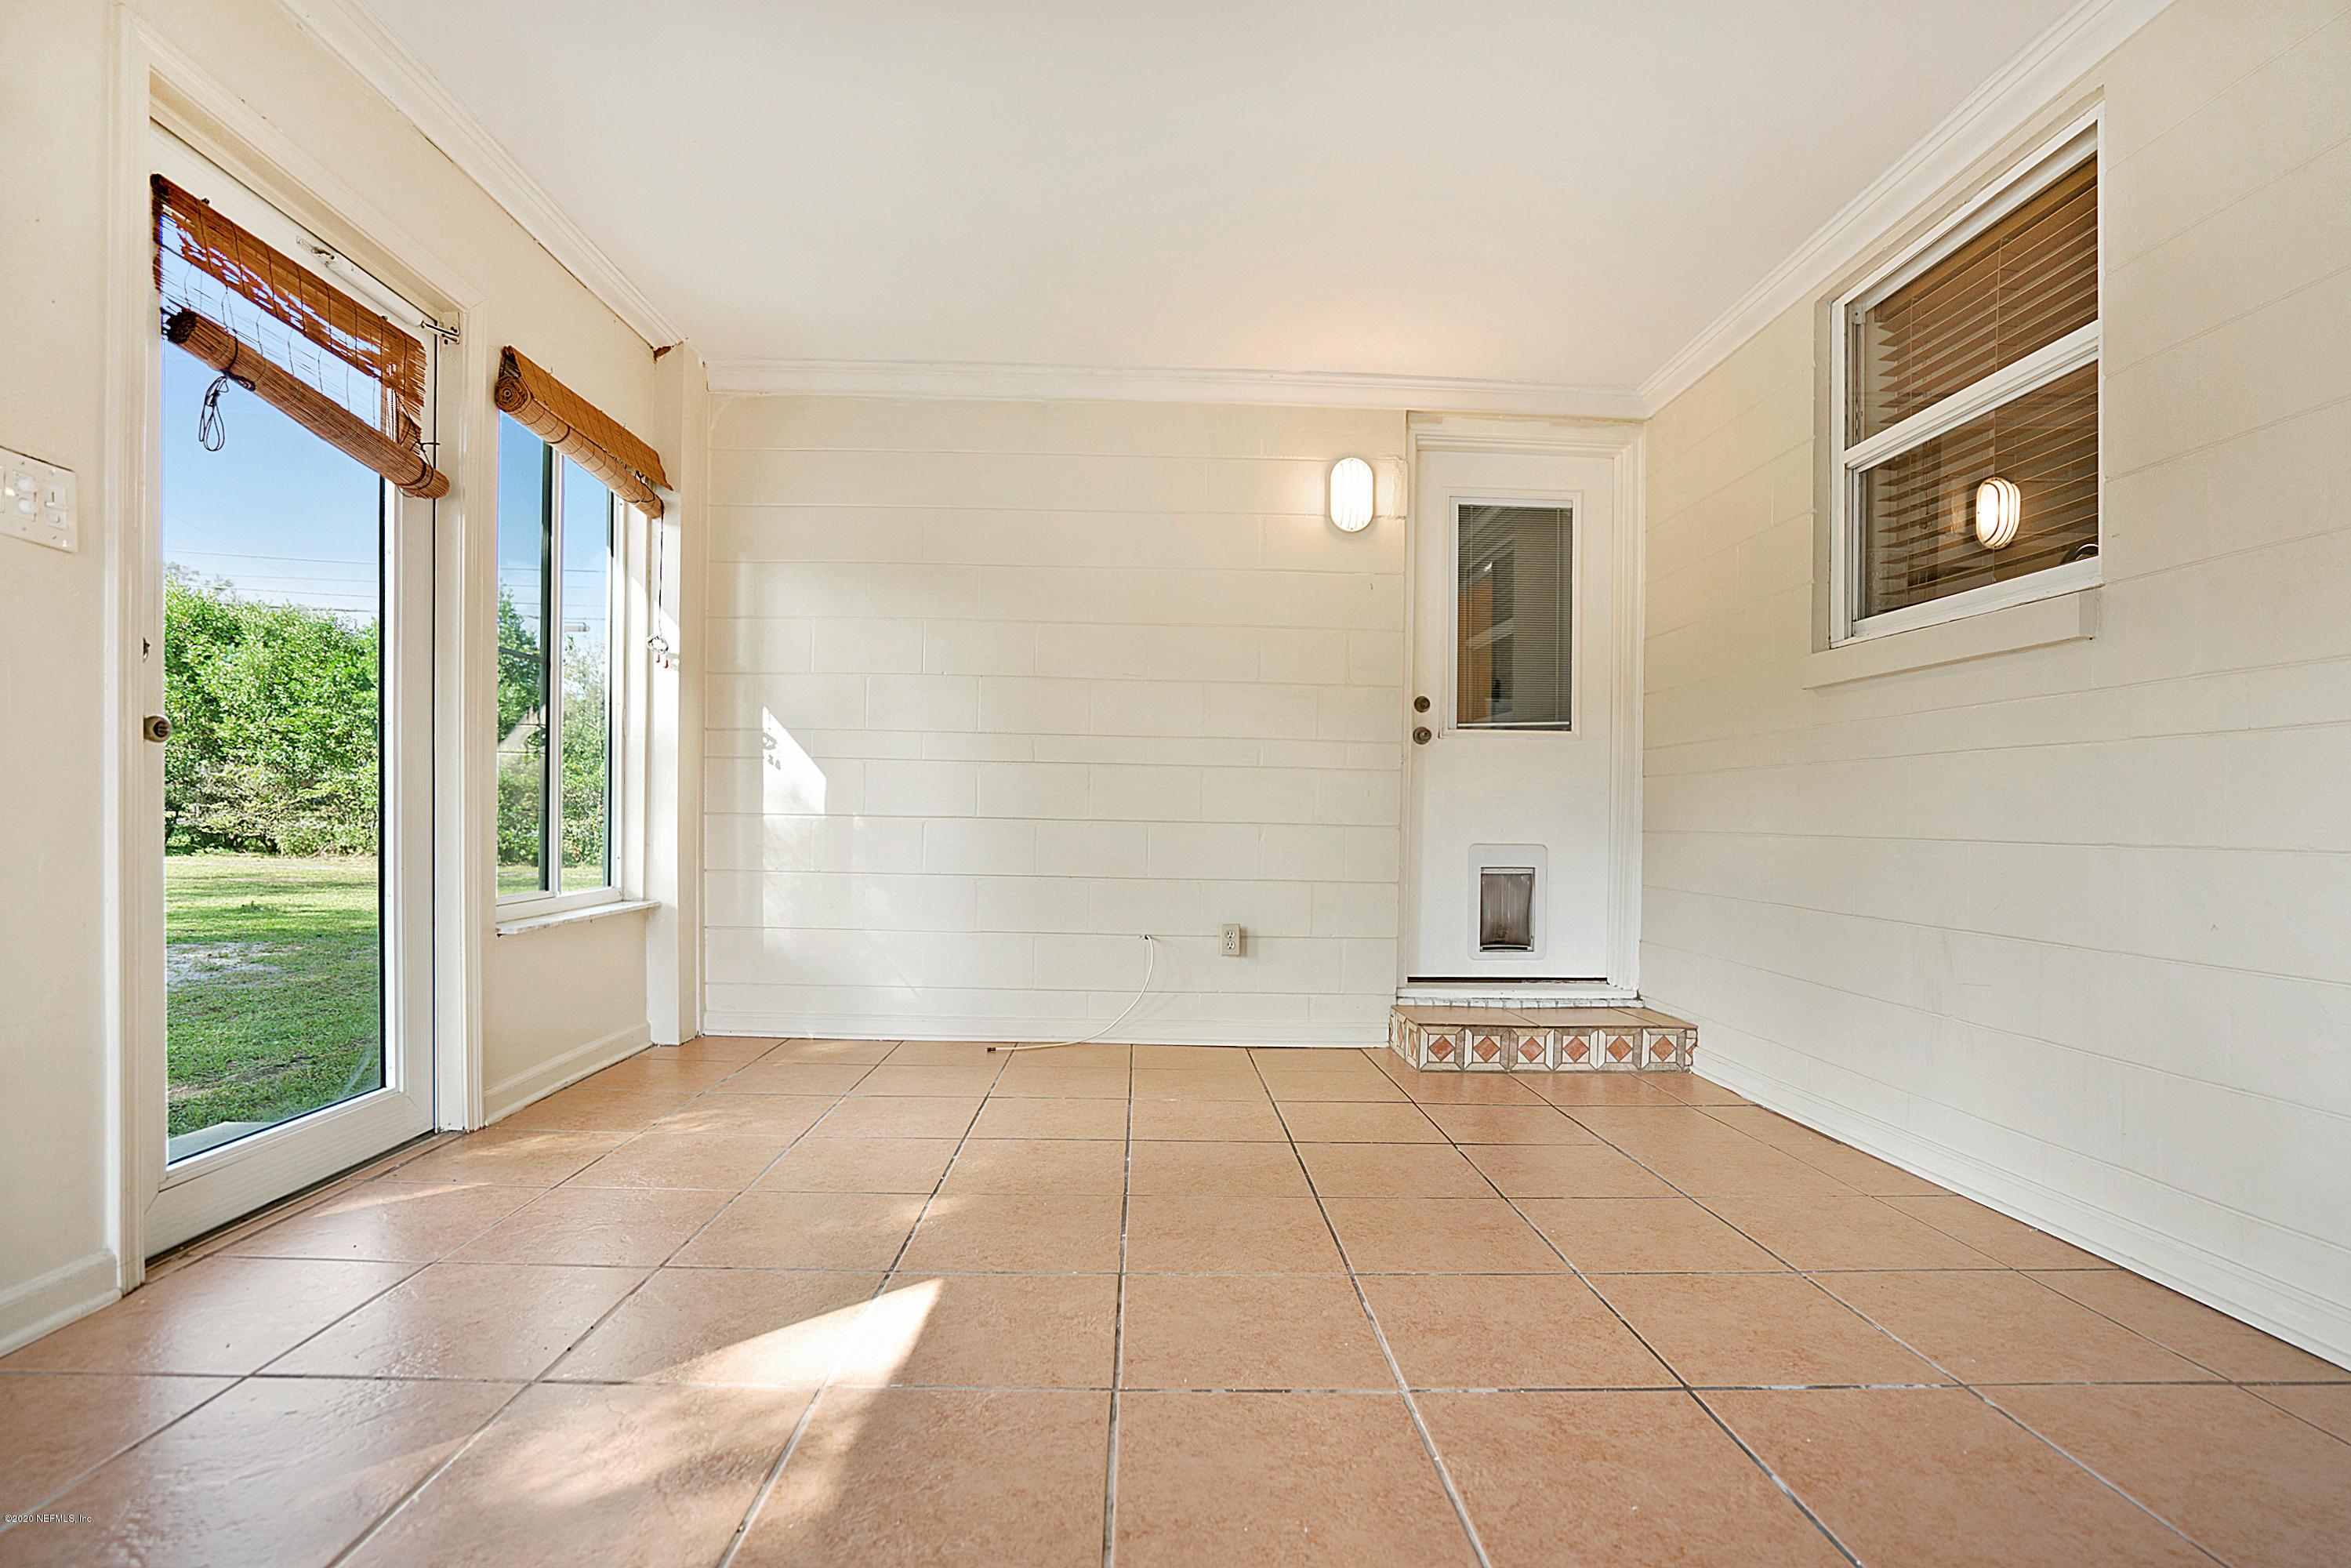 5504 PAULBETT, JACKSONVILLE, FLORIDA 32277, 4 Bedrooms Bedrooms, ,2 BathroomsBathrooms,Residential,For sale,PAULBETT,1080293